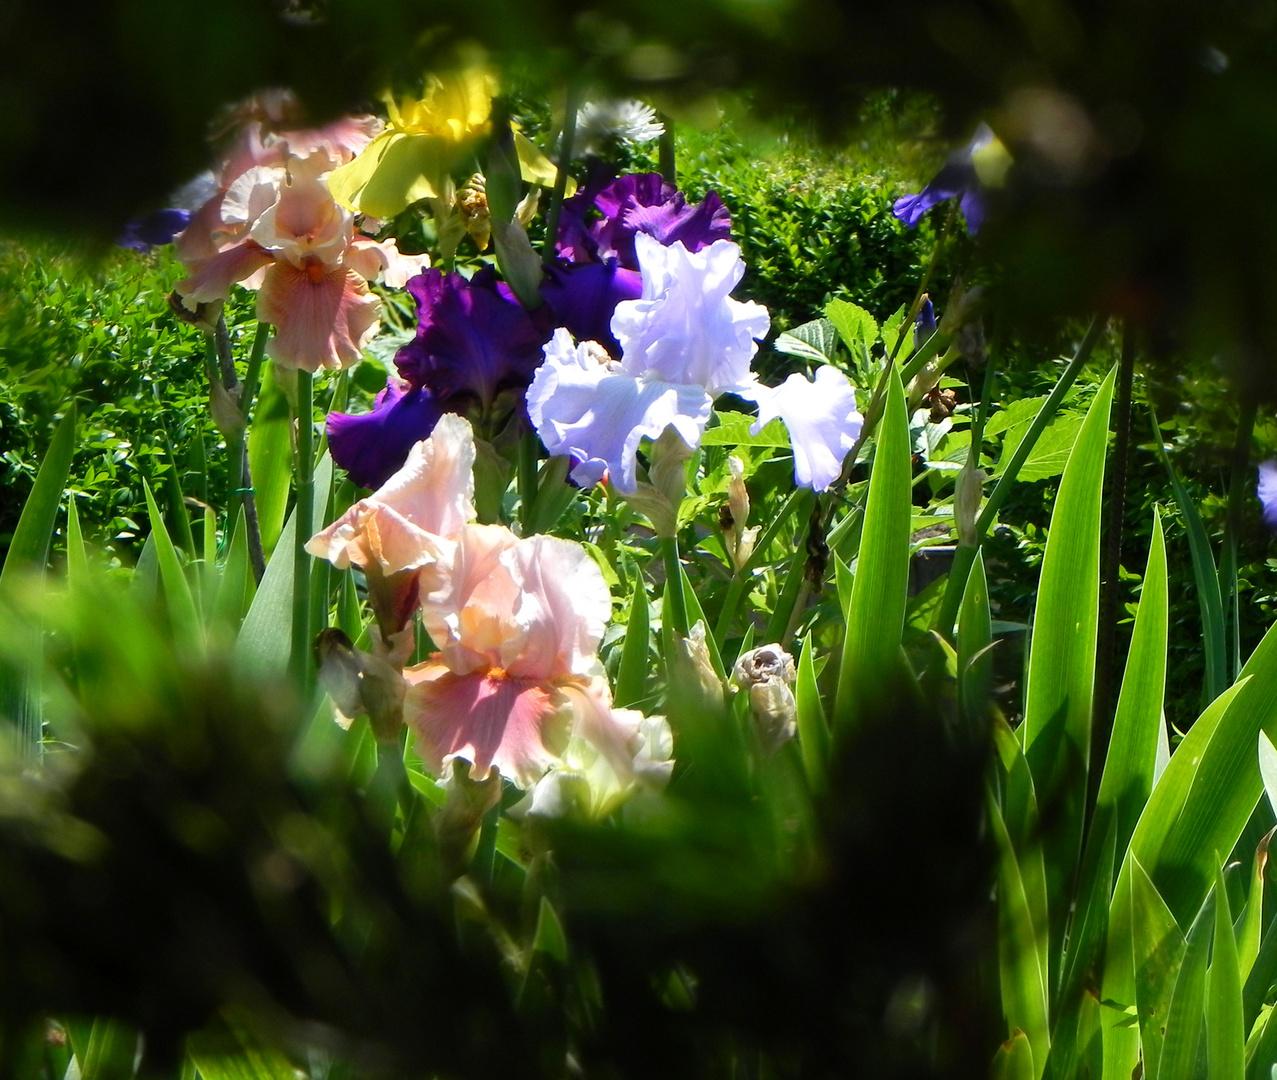 mon regard sur les iris